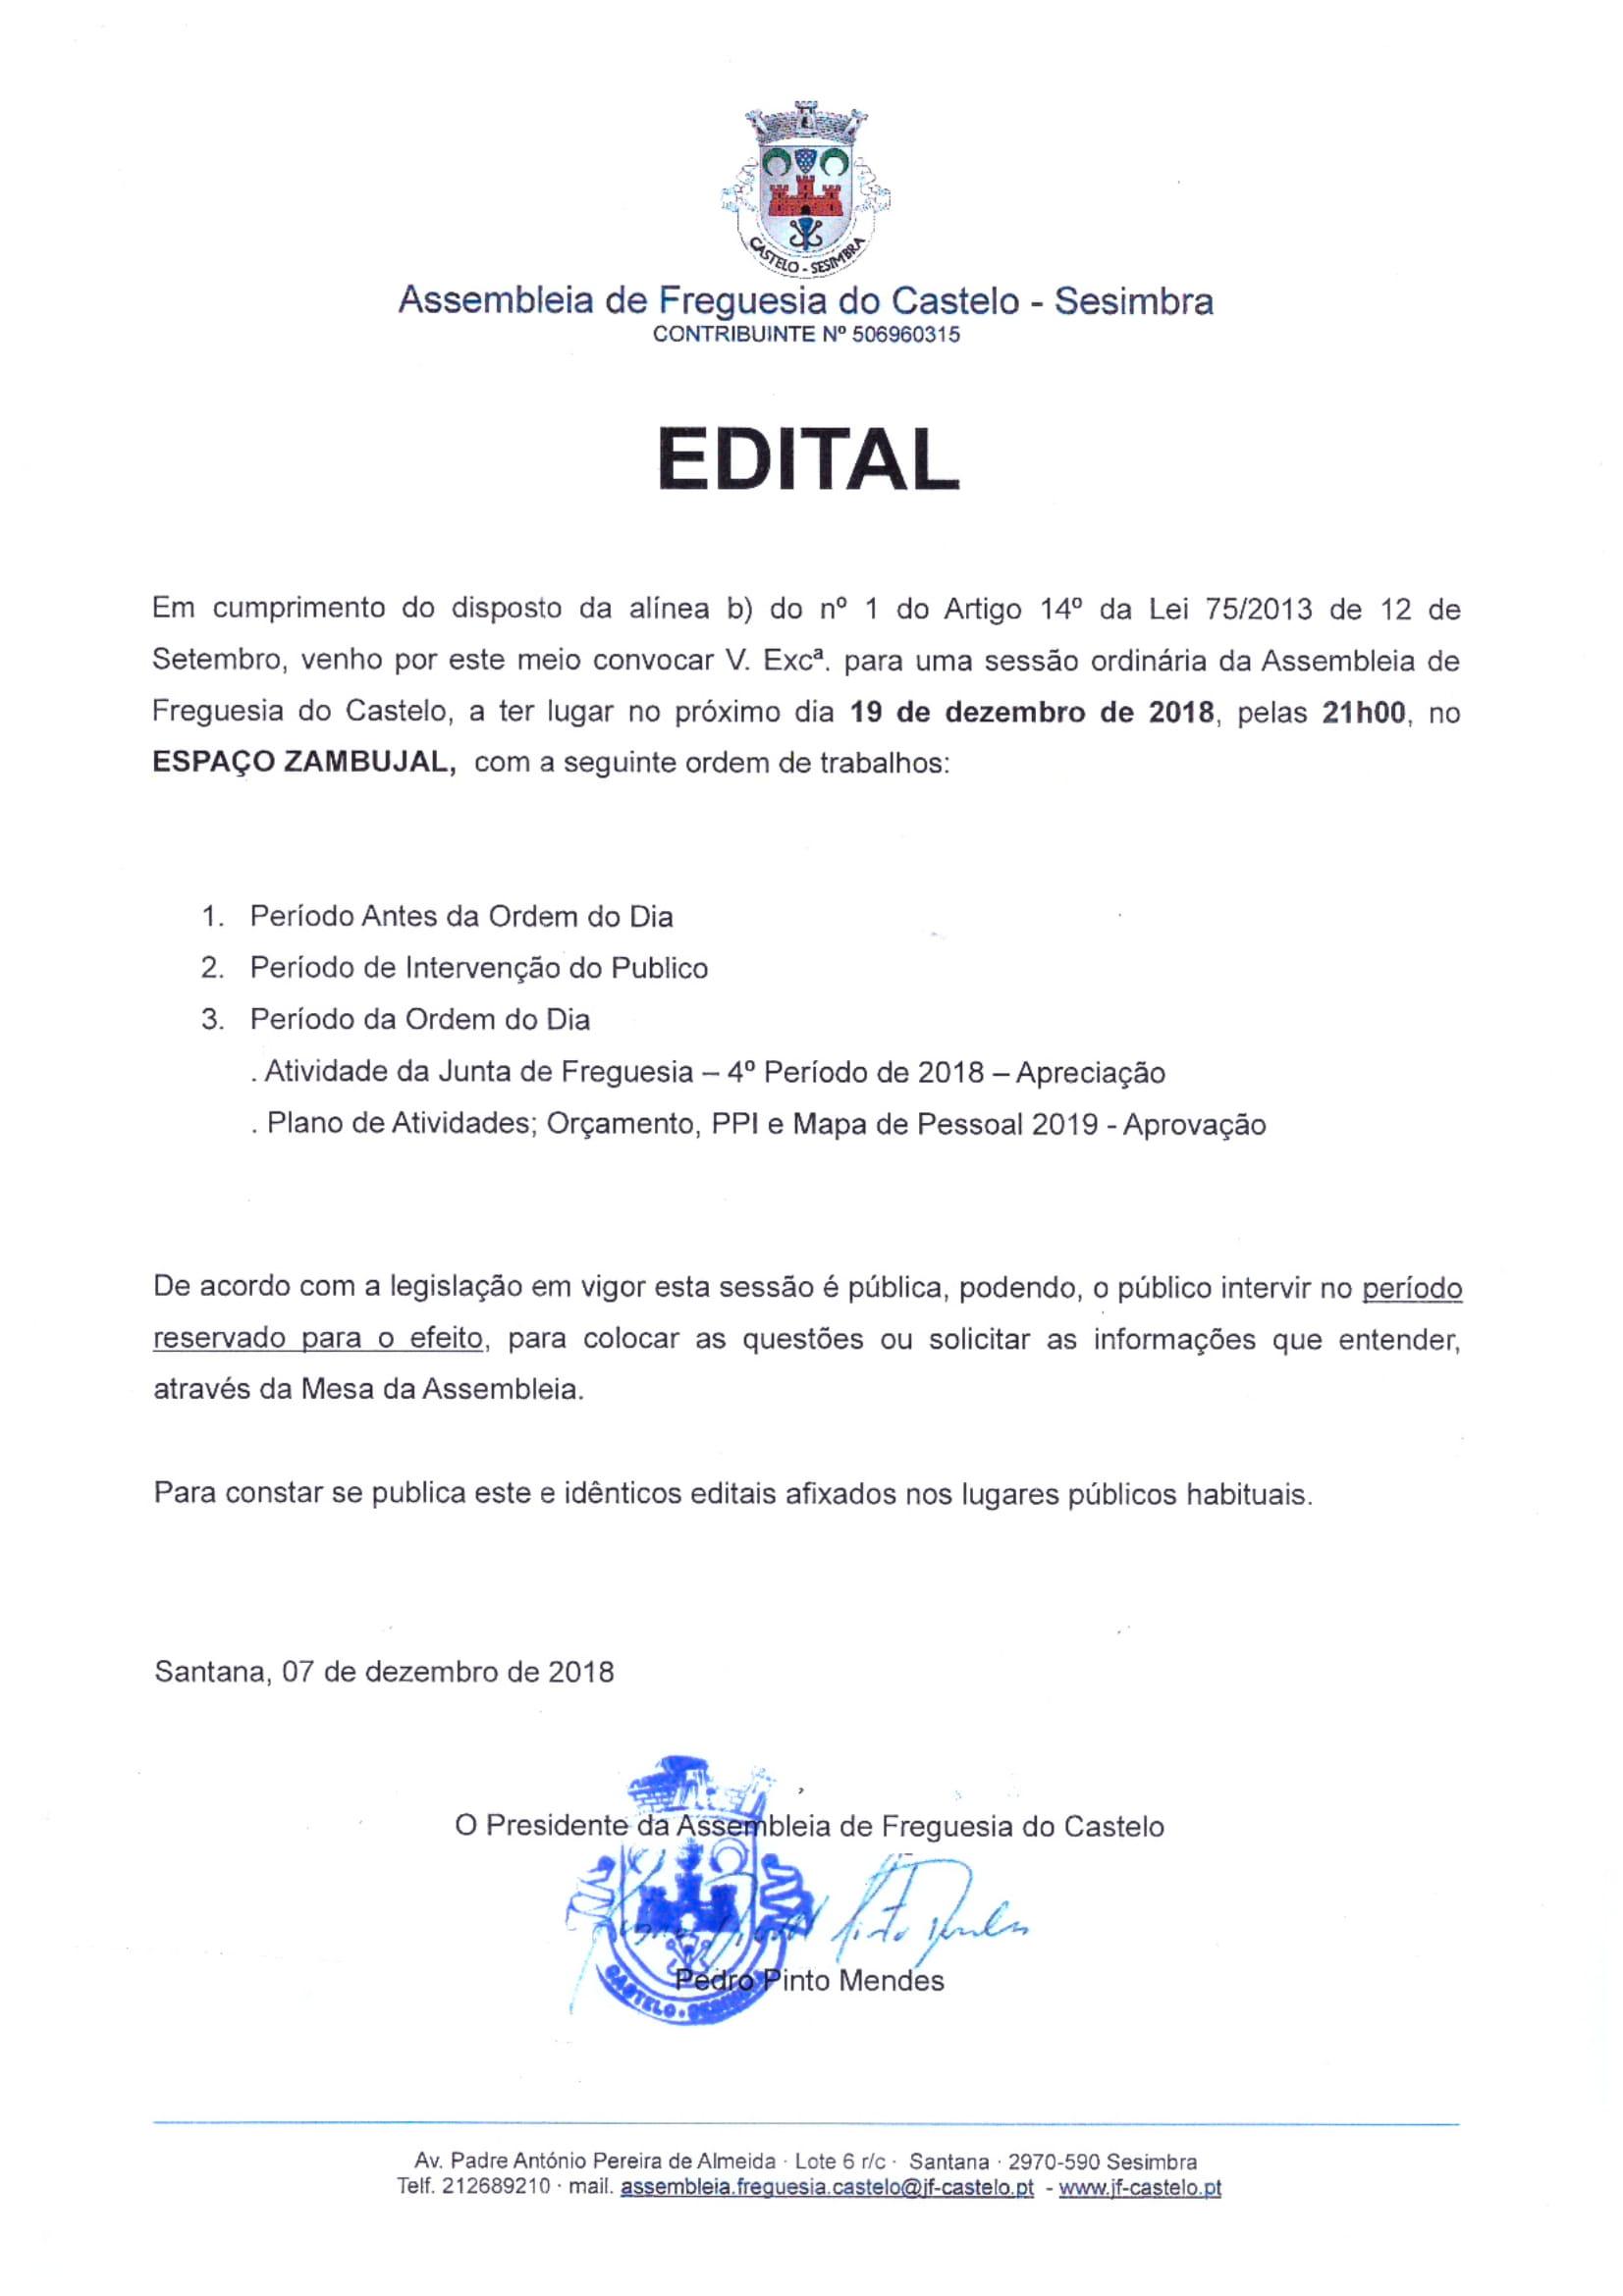 Assembleia de Freguesia | 19 Dezembro